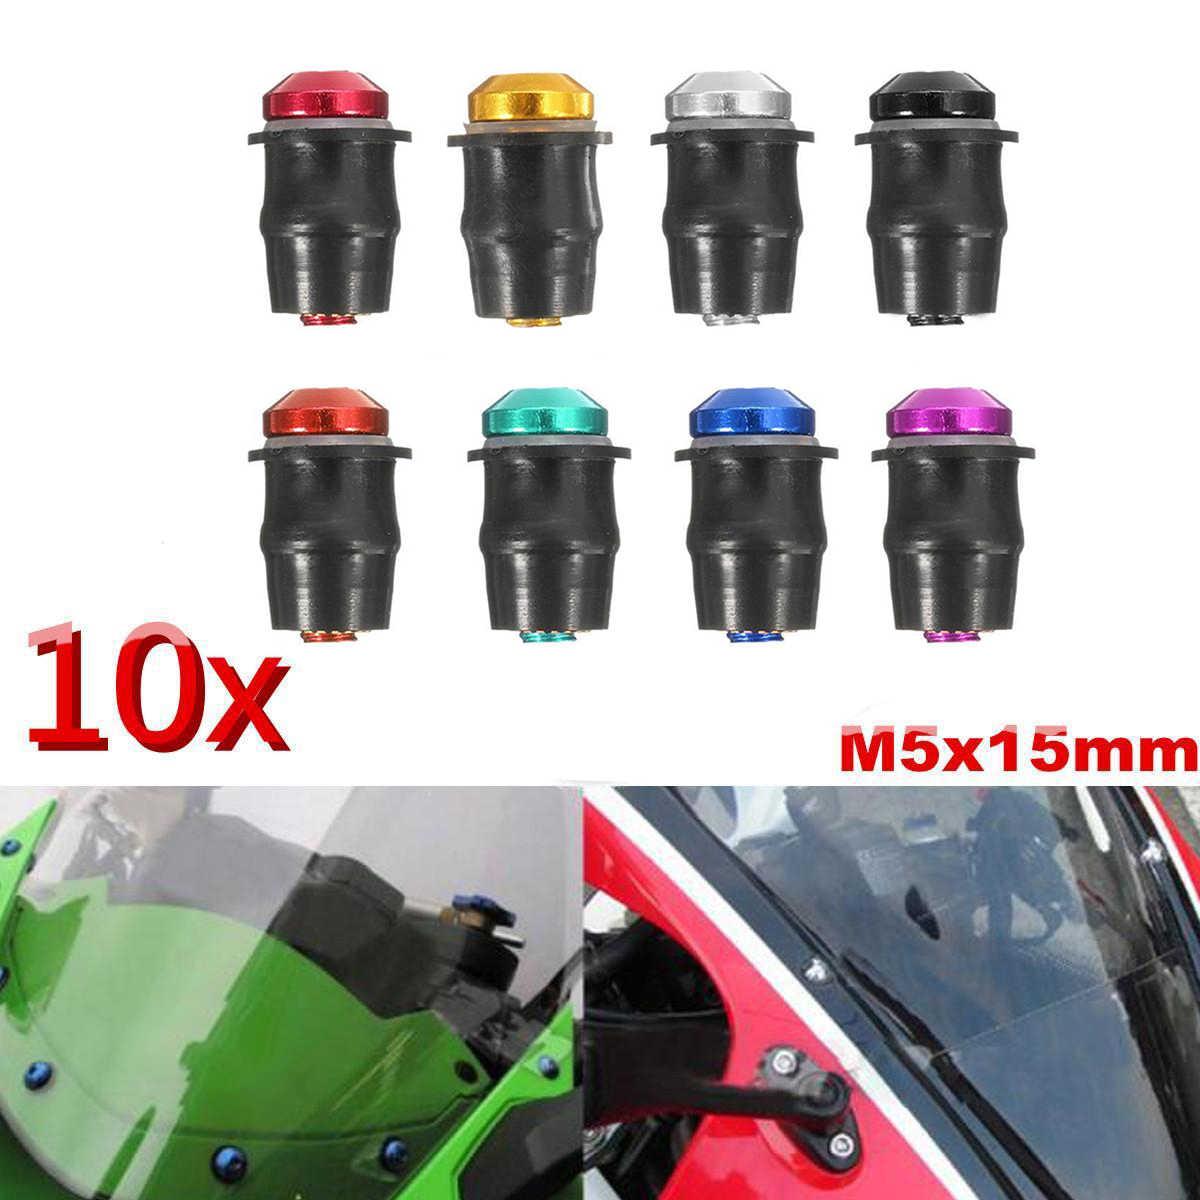 10Pcs Set M5x15mm Aluminium Motor Hadiah Sekrup Baut Kit Tubuh Mount untuk Sepeda Motor Kaca Depan Kaca Depan Sekrup Baut Mur